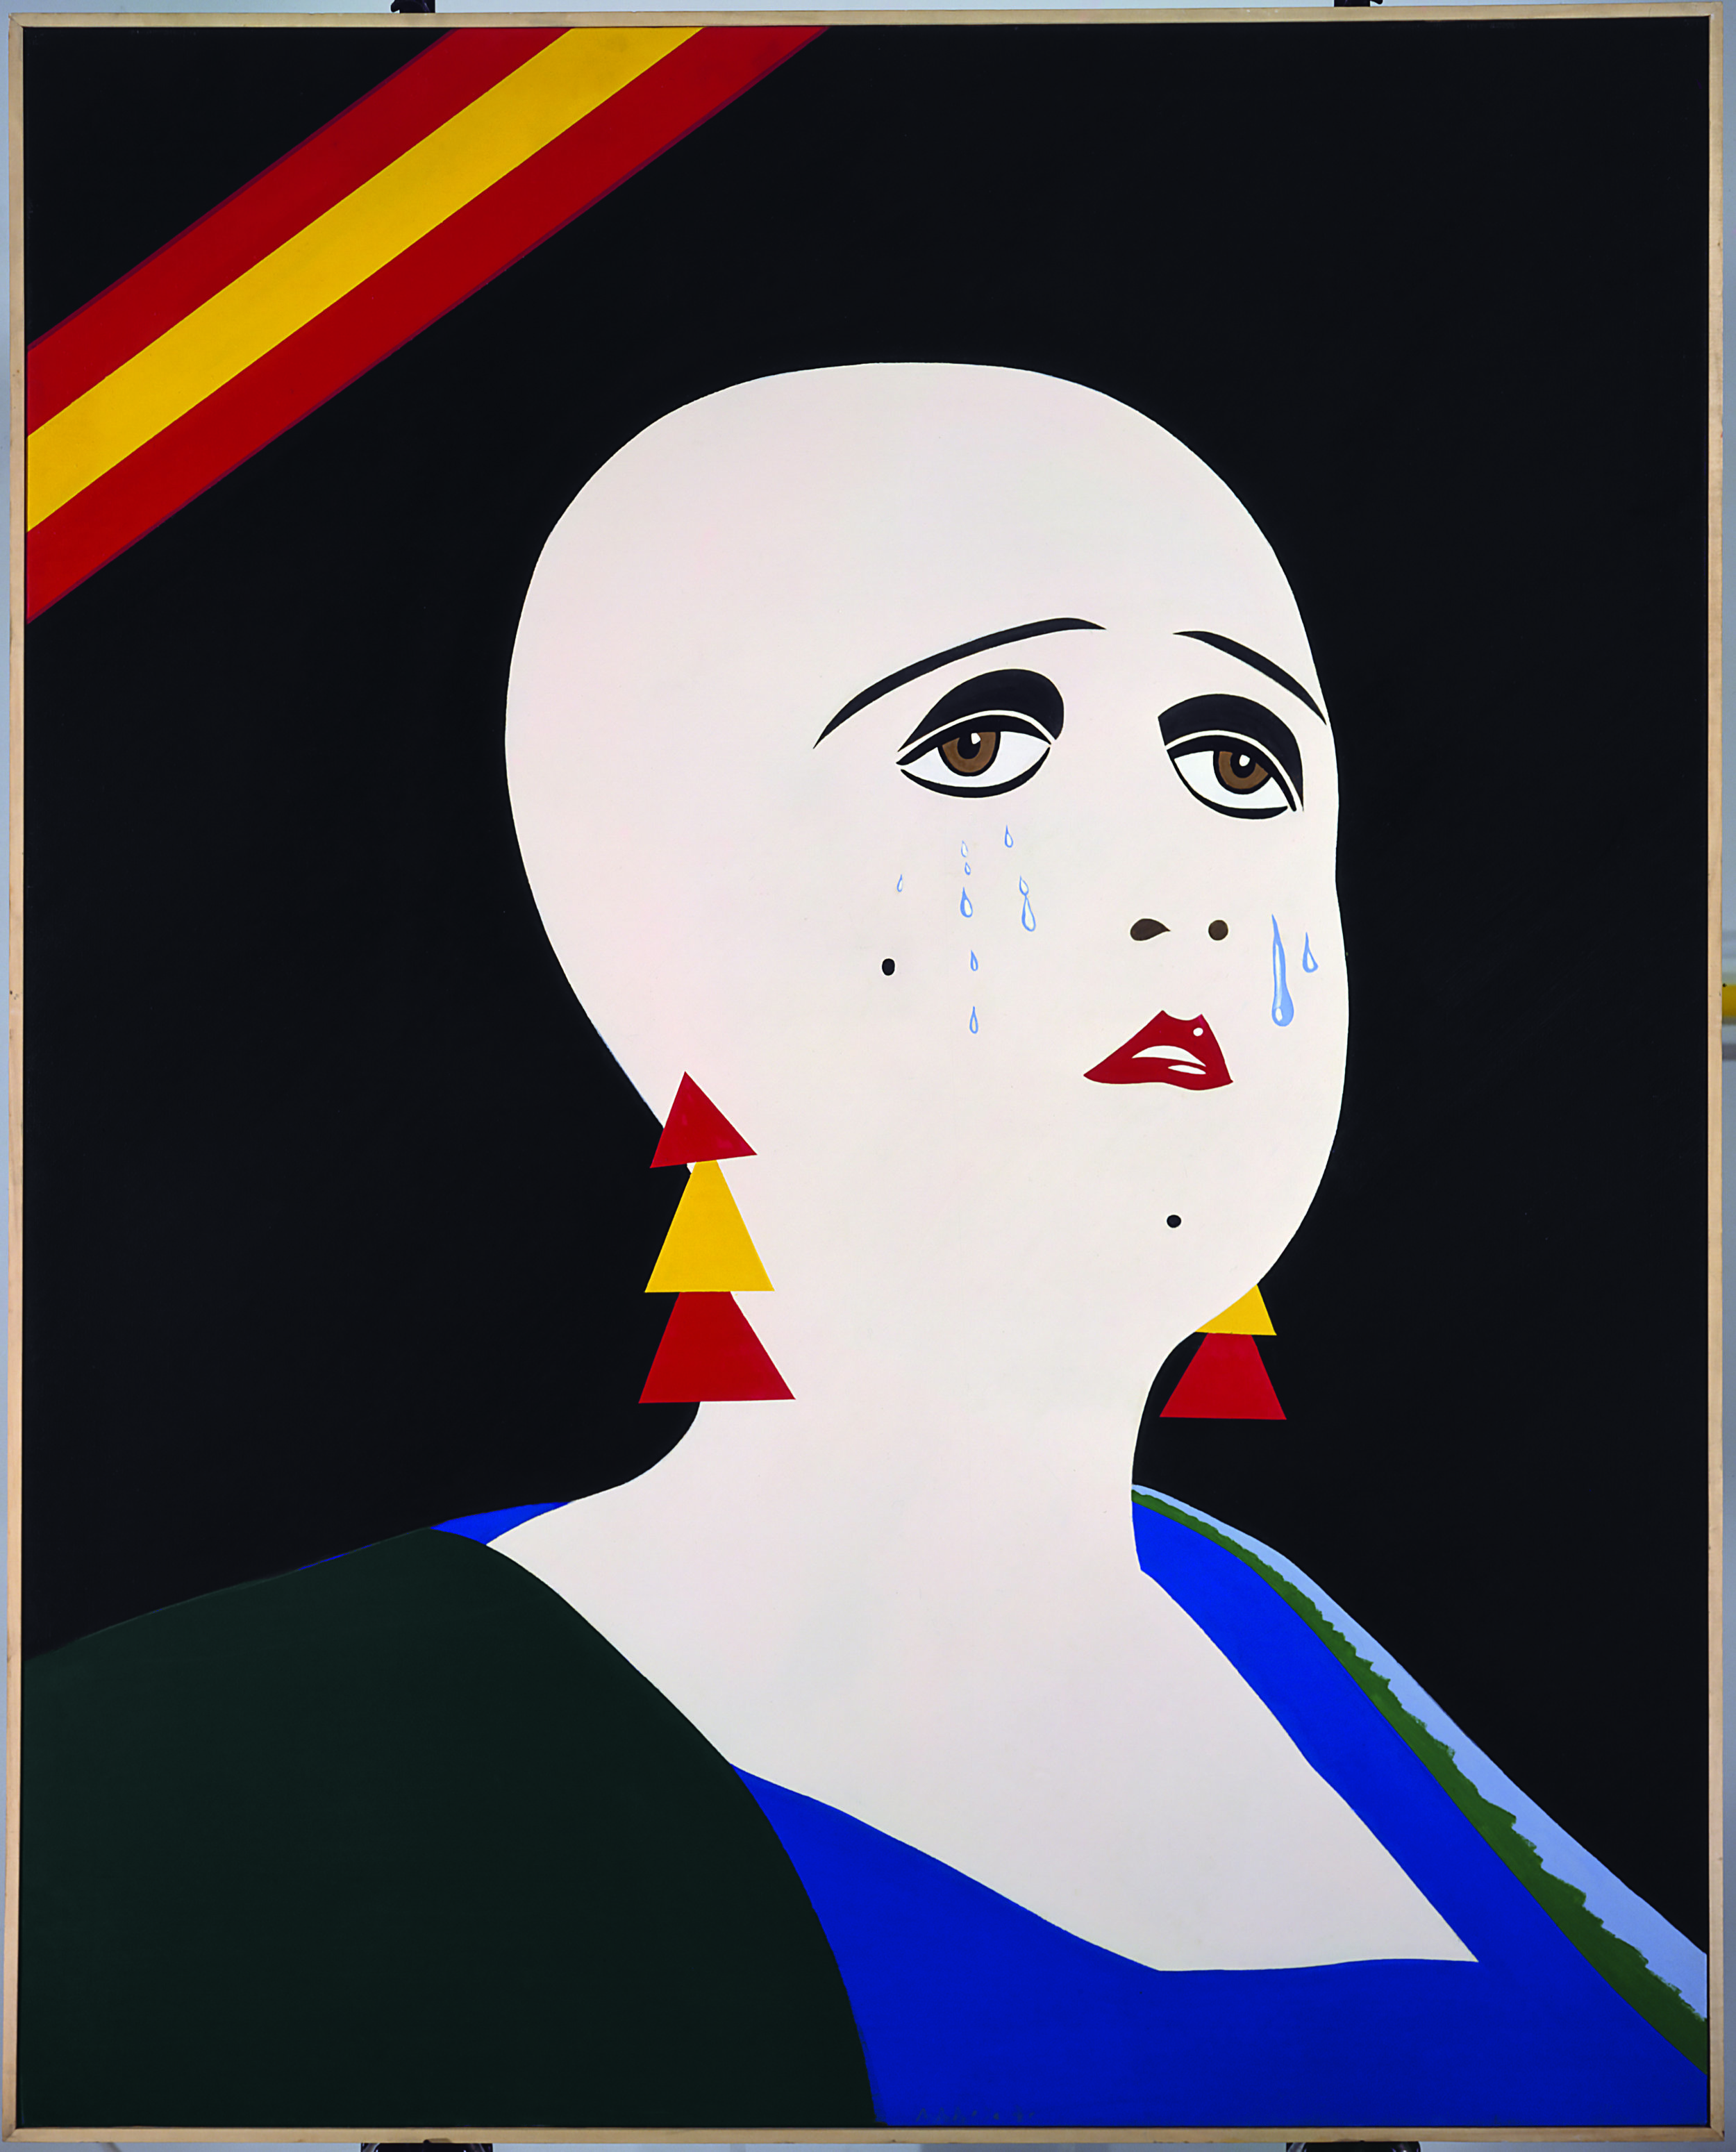 La mujer del minero Pérez Martinez llamada Tina es rapada por la policia (1970)   Eduardo Arroyo   © Adagp Paris 2017. Photo DR